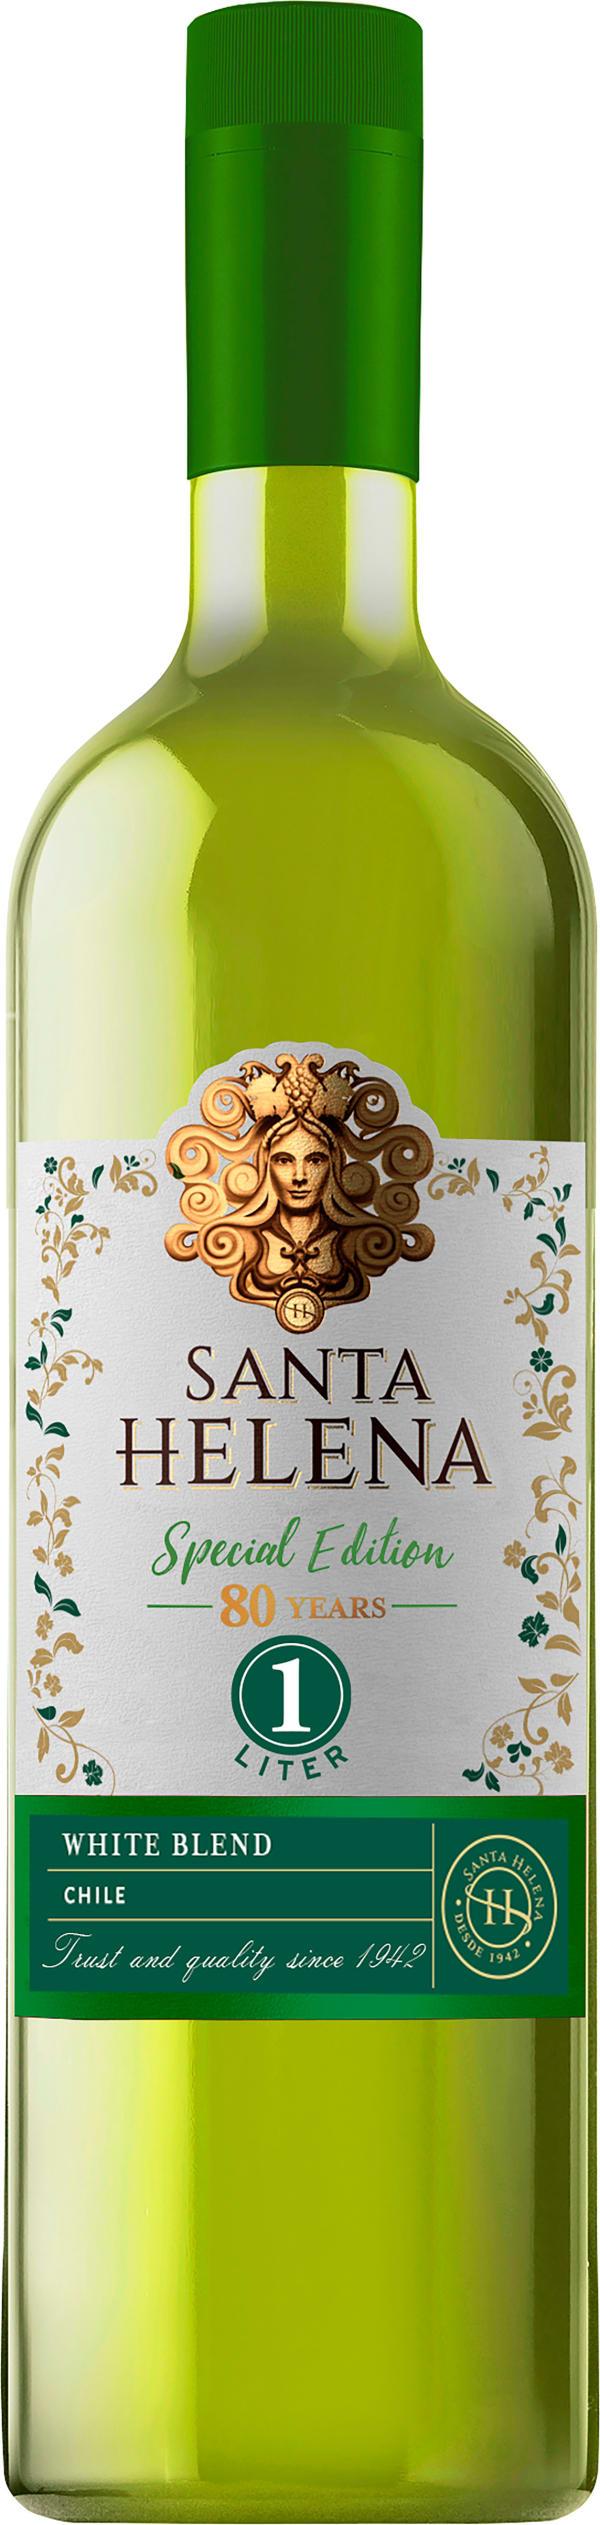 Santa Helena Varietal White Blend 2019 plastflaska